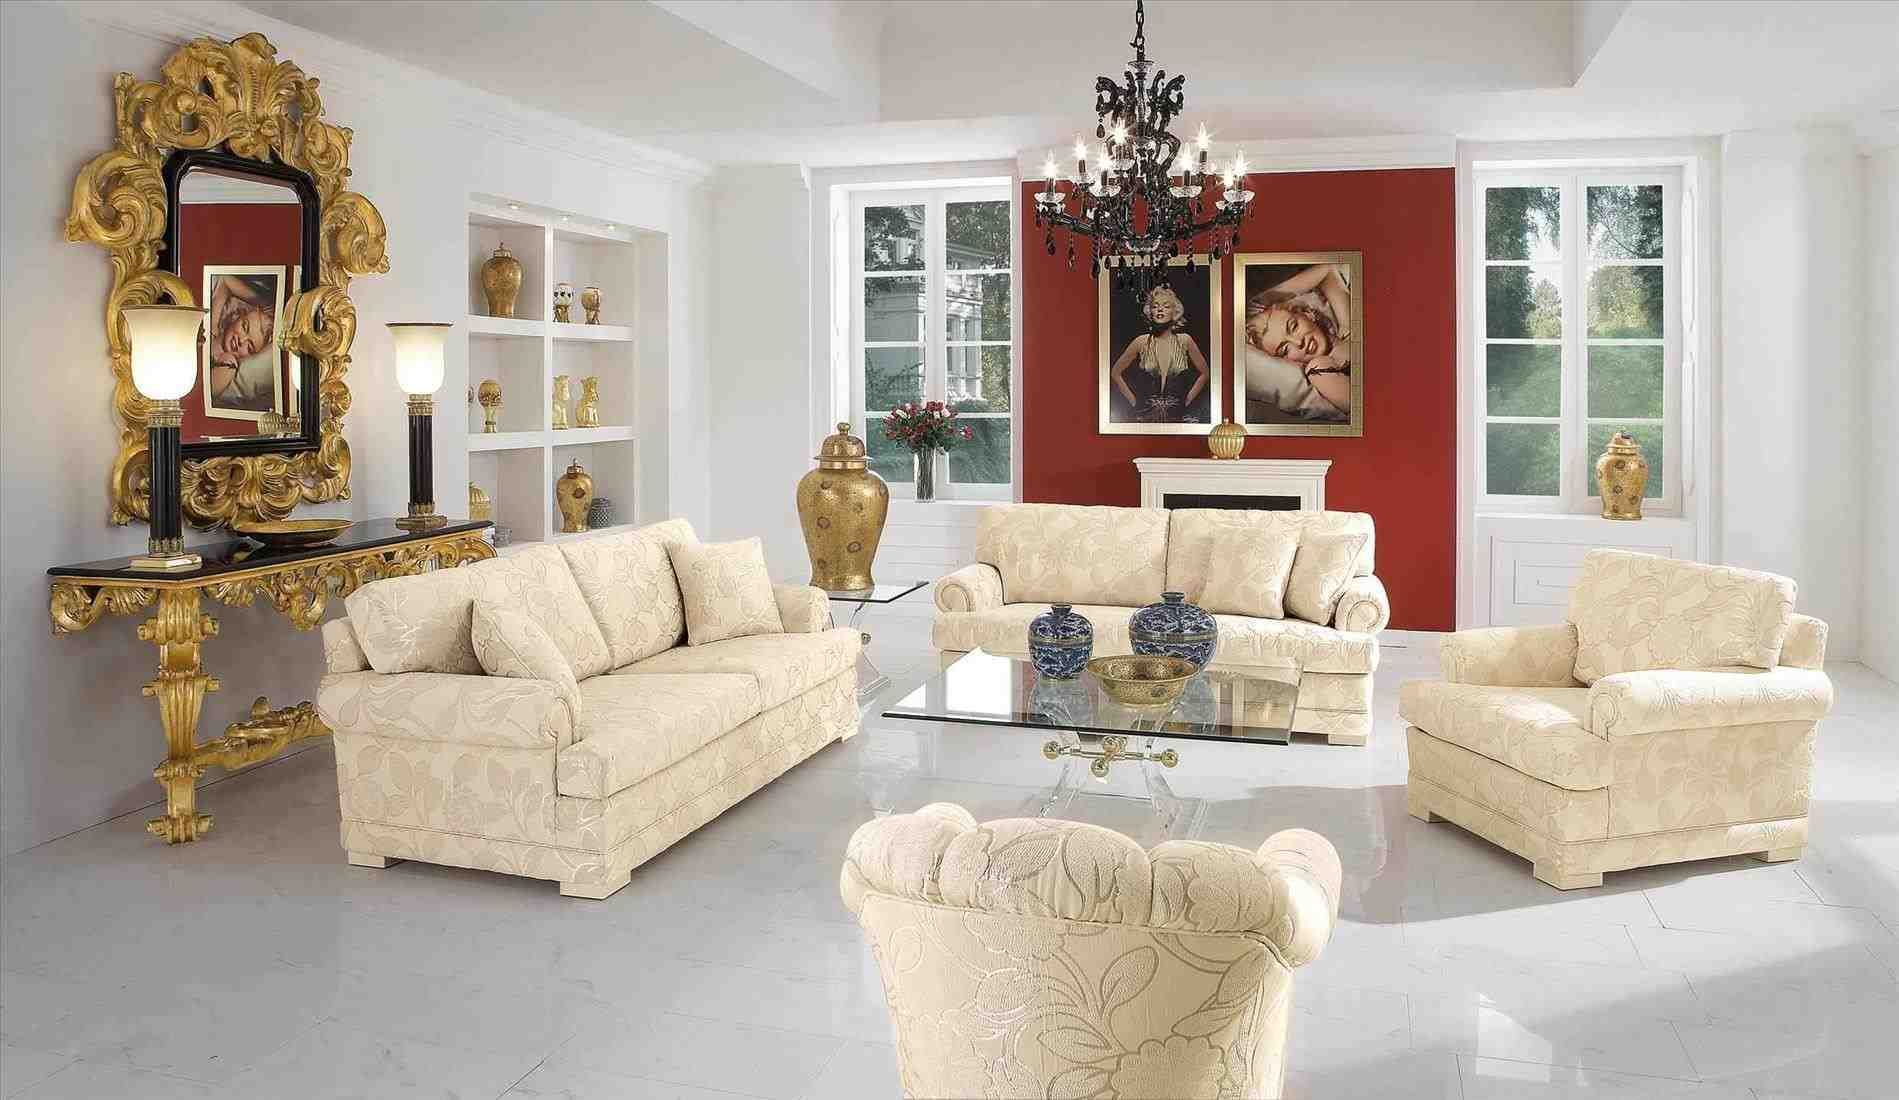 Cheap Living Room Furniture In Greensboro Nc - furnishings a store